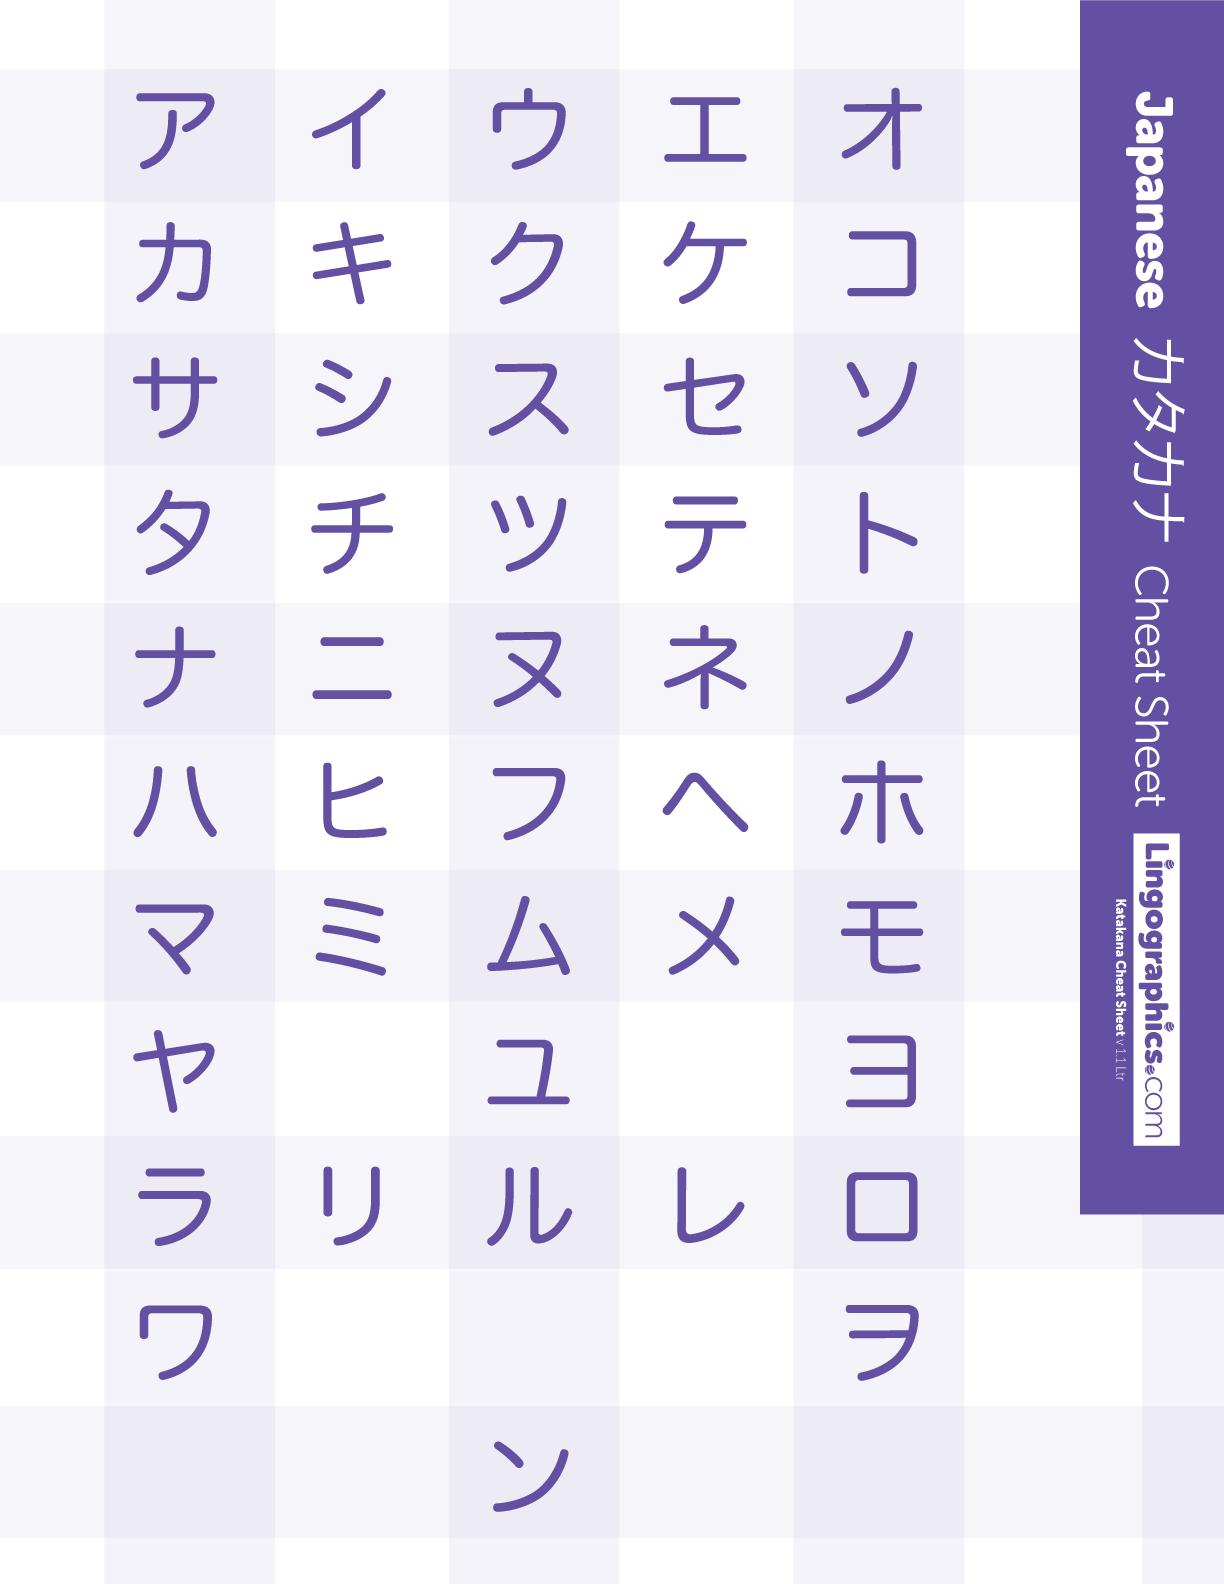 Japanese Katakana cheat sheet